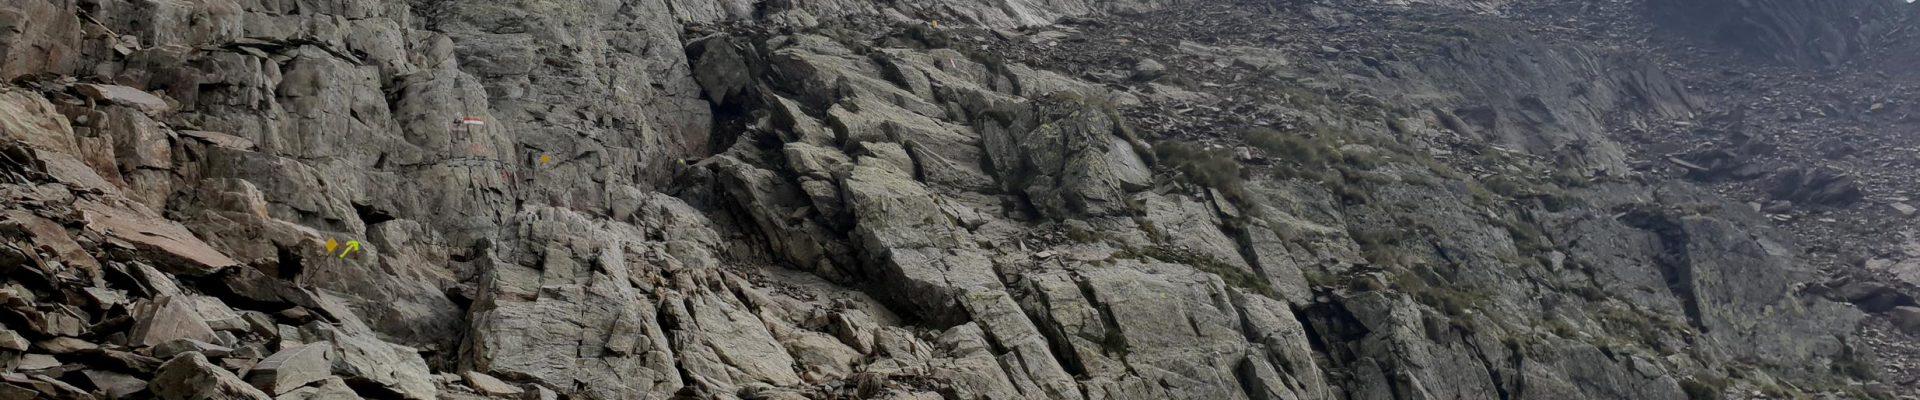 Südtirol Ultra Skyrace [SUSR] | Die Hufeisentour